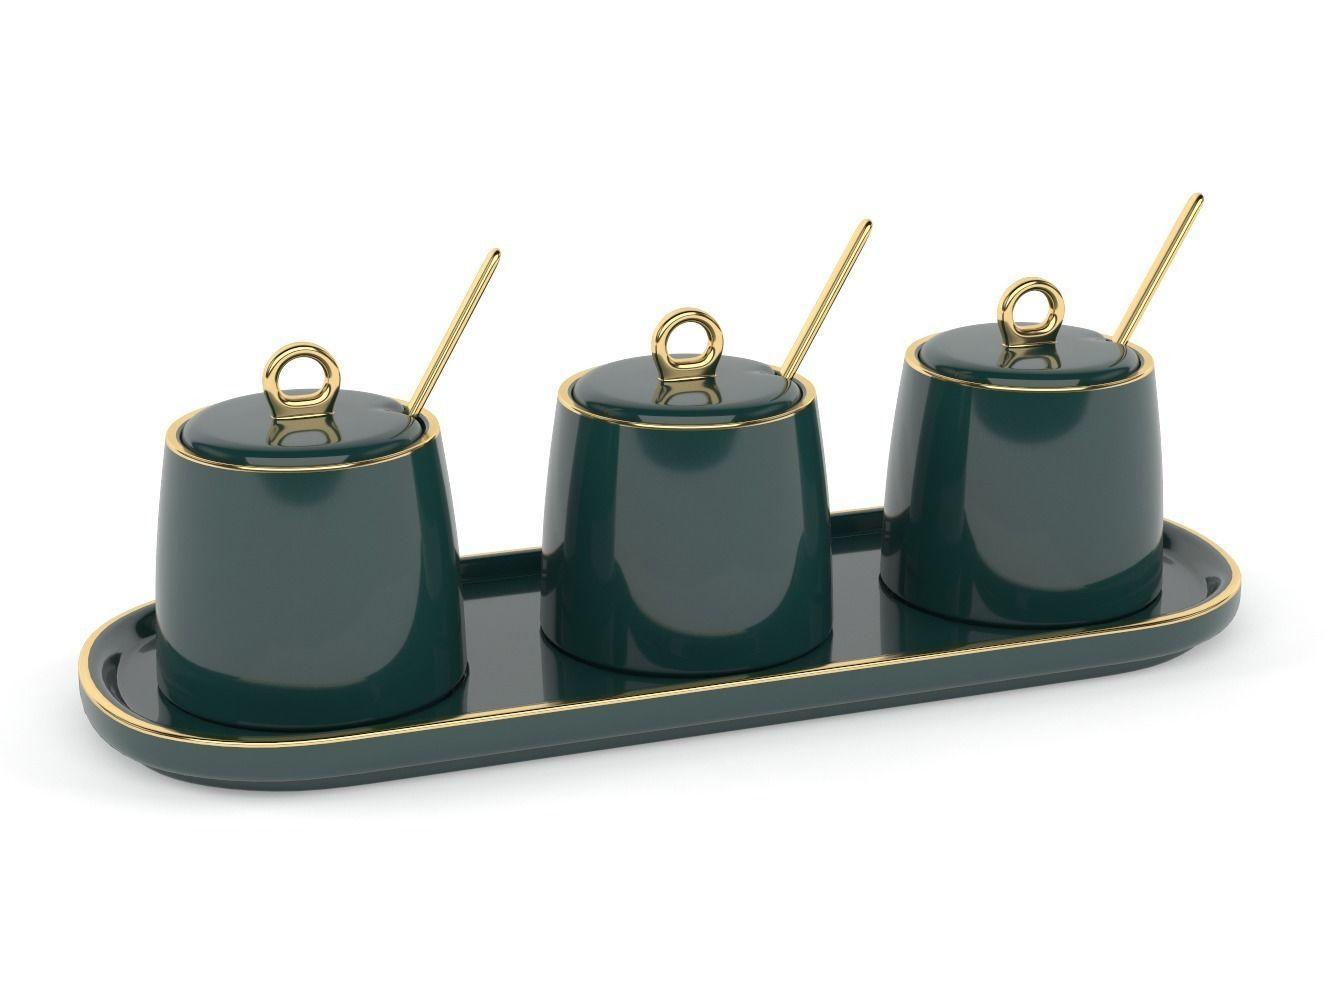 Green Ceramic Sugar Bowls